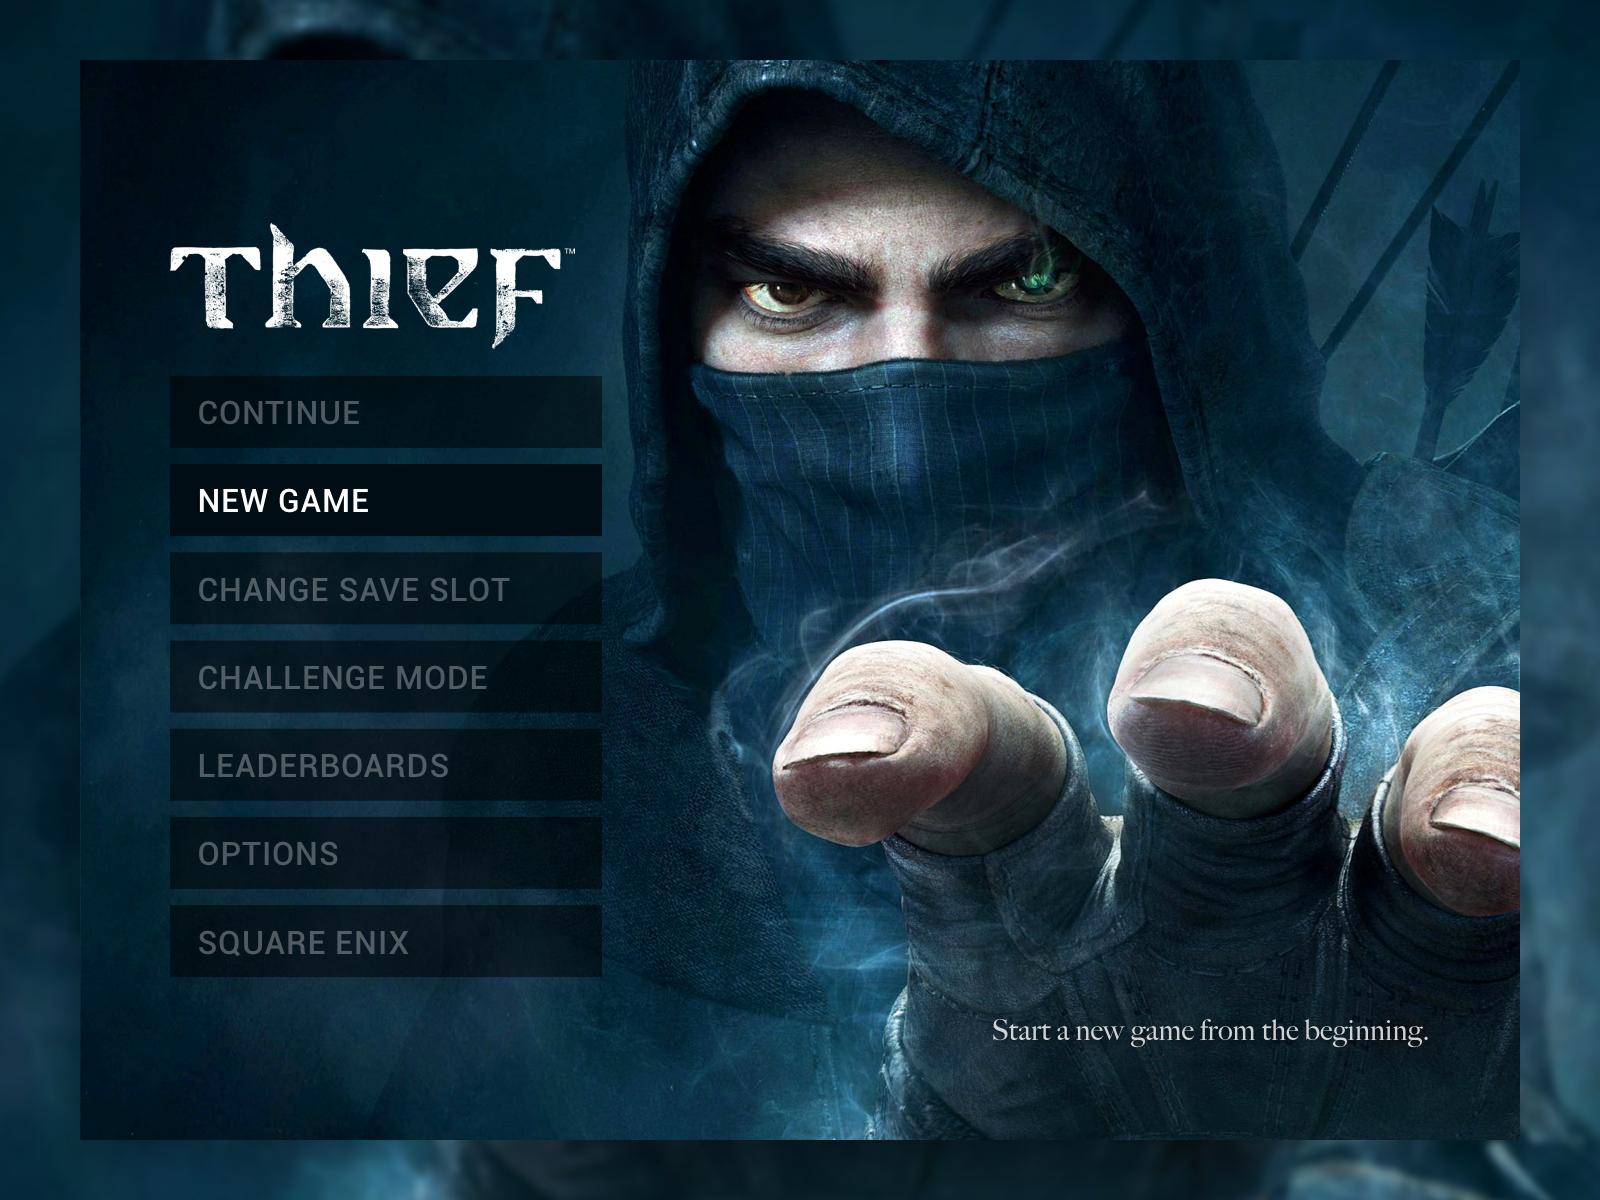 Thief Main Menu UI